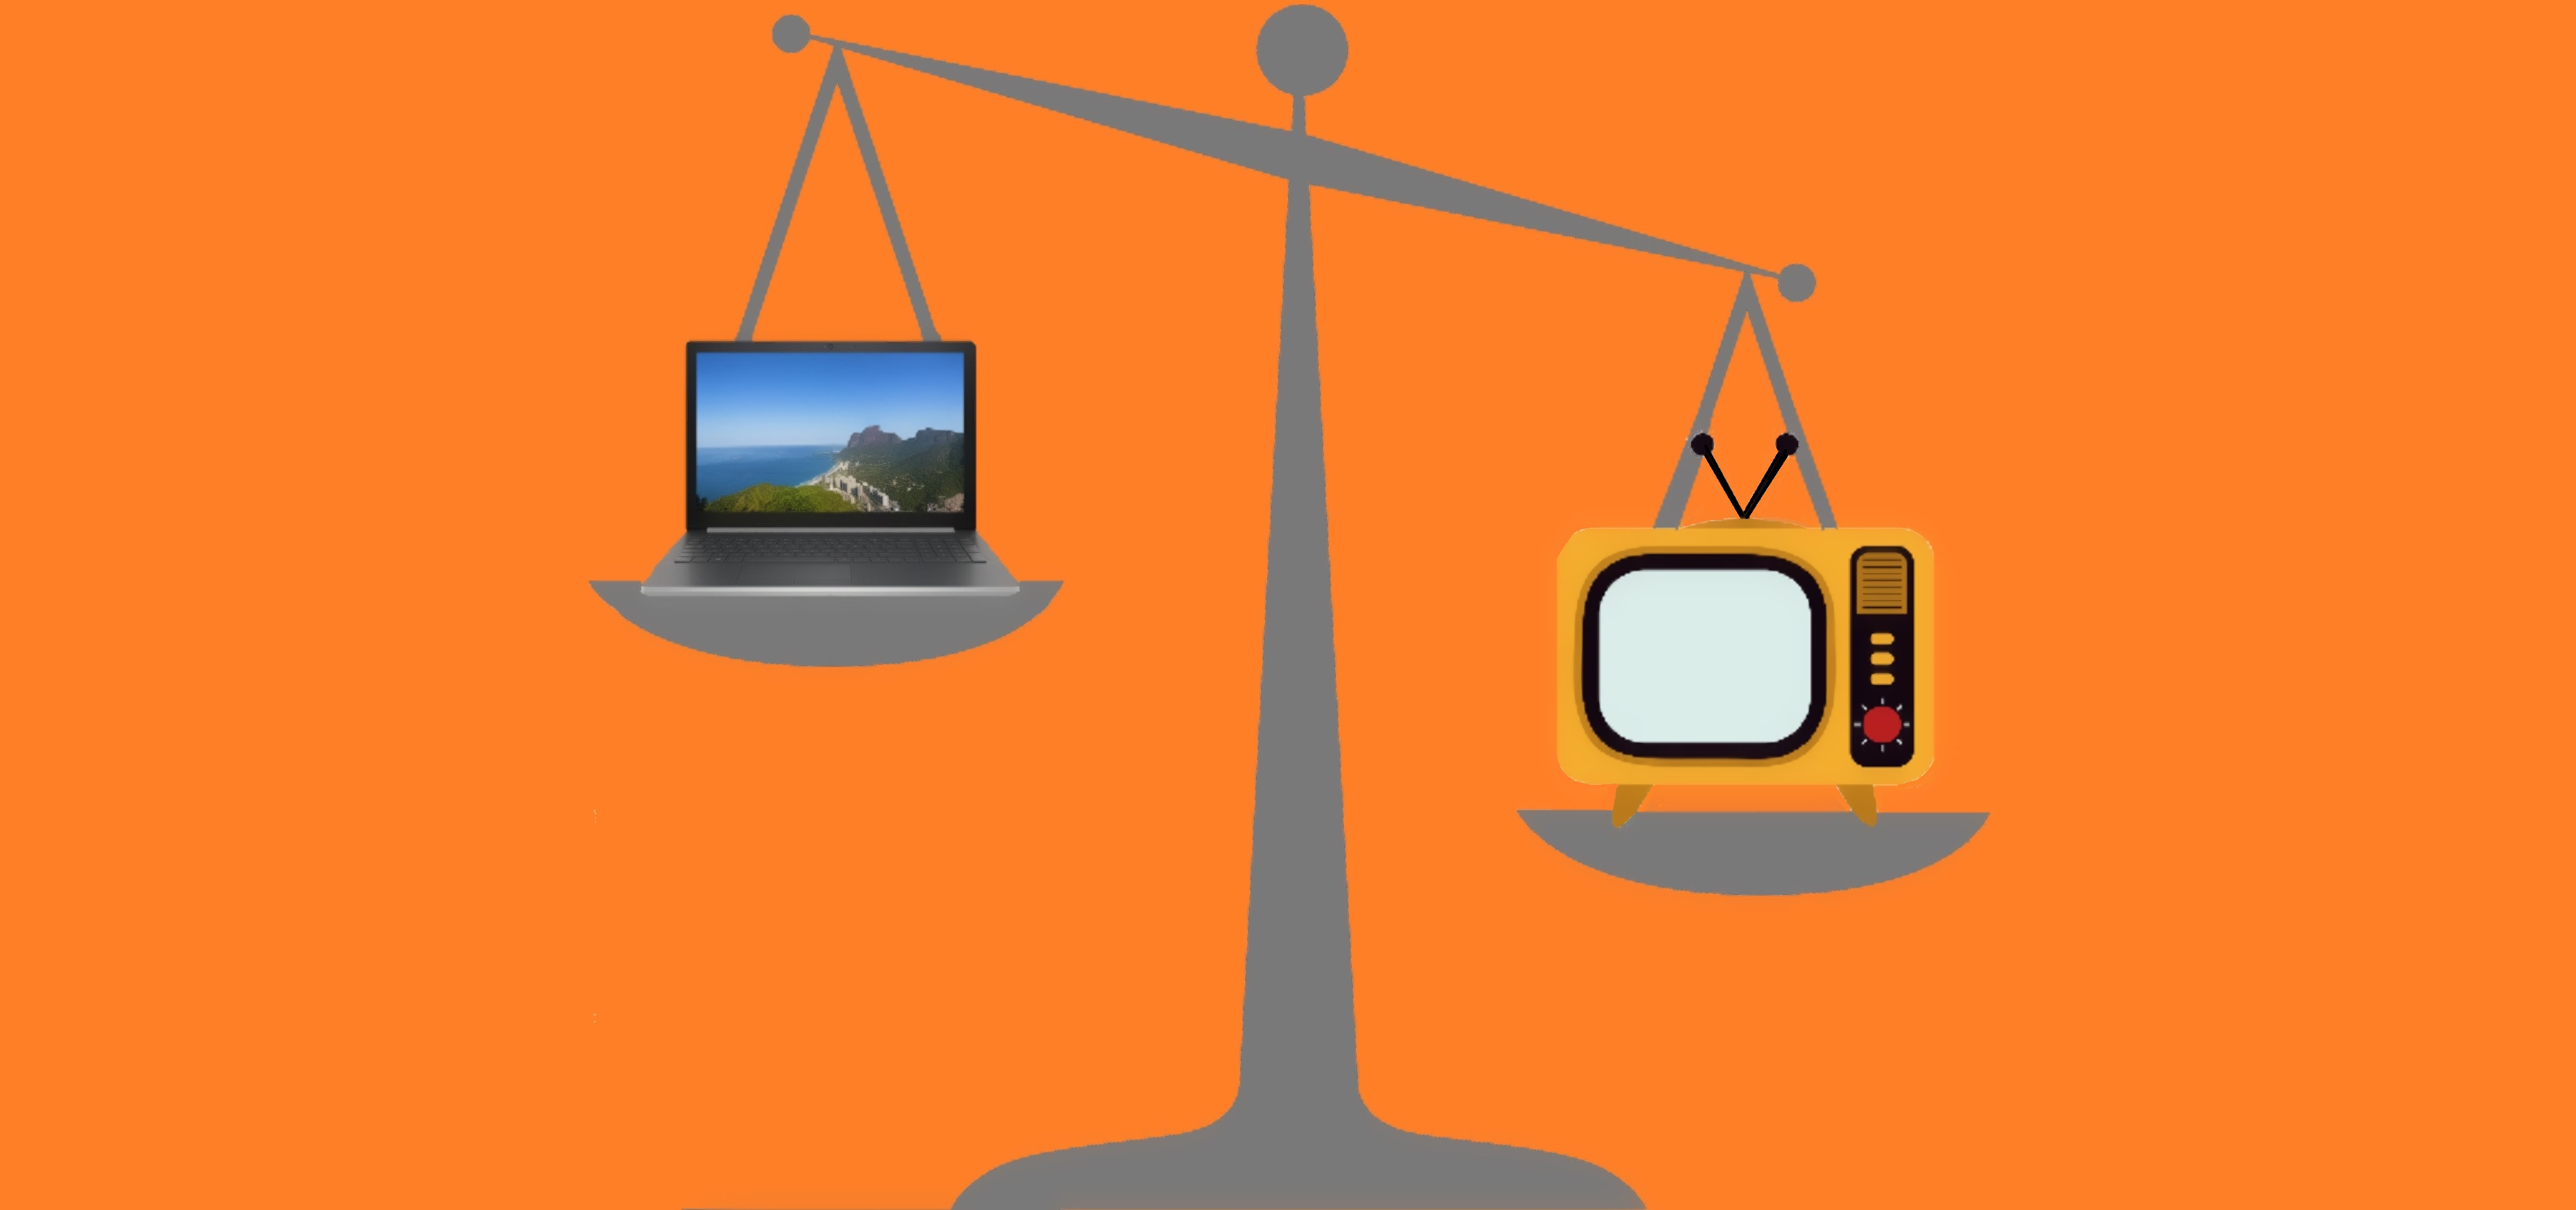 TV or Internet?